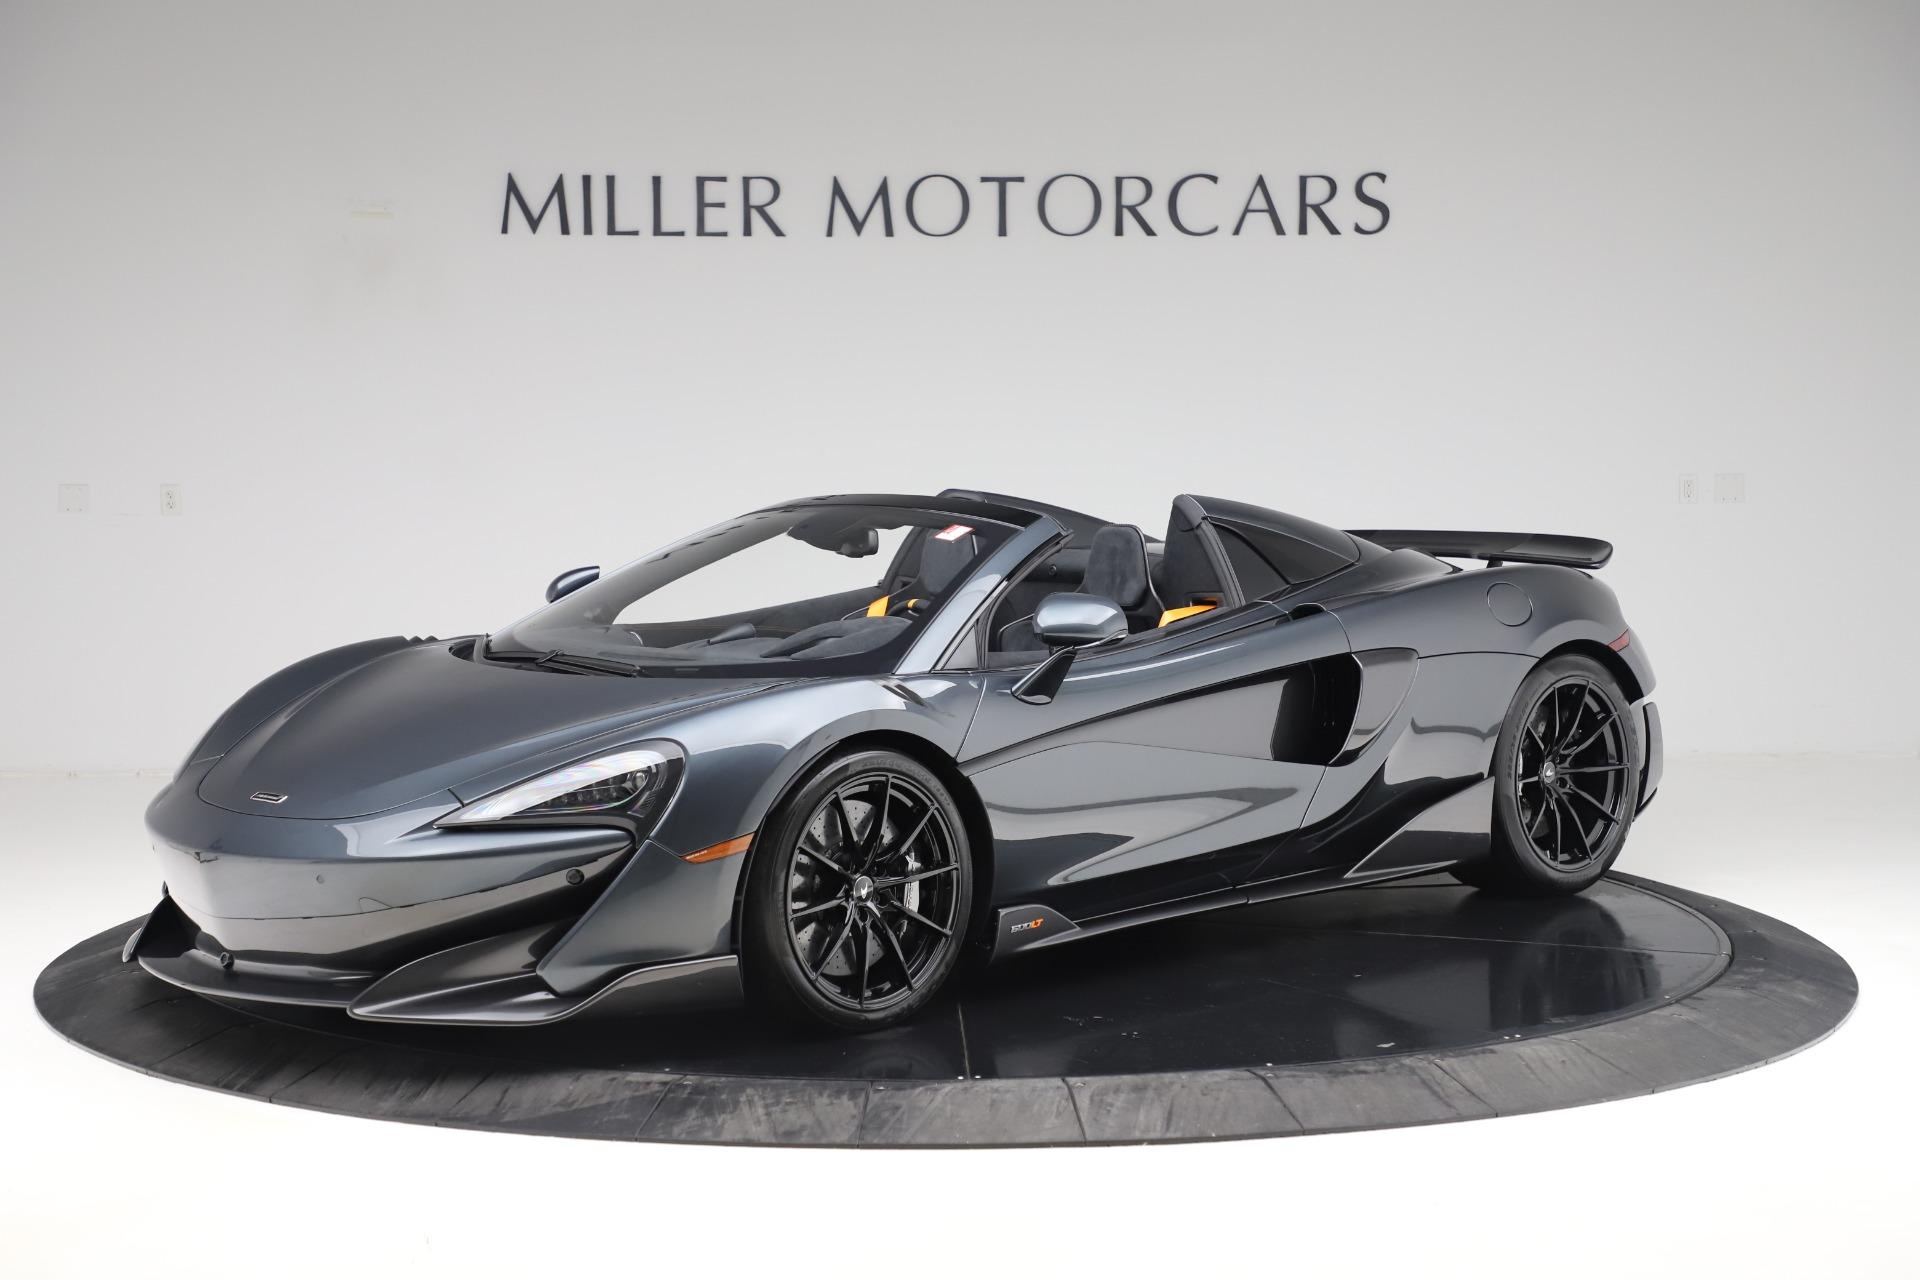 Used 2020 McLaren 600LT SPIDER Convertible for sale $249,900 at Alfa Romeo of Westport in Westport CT 06880 1